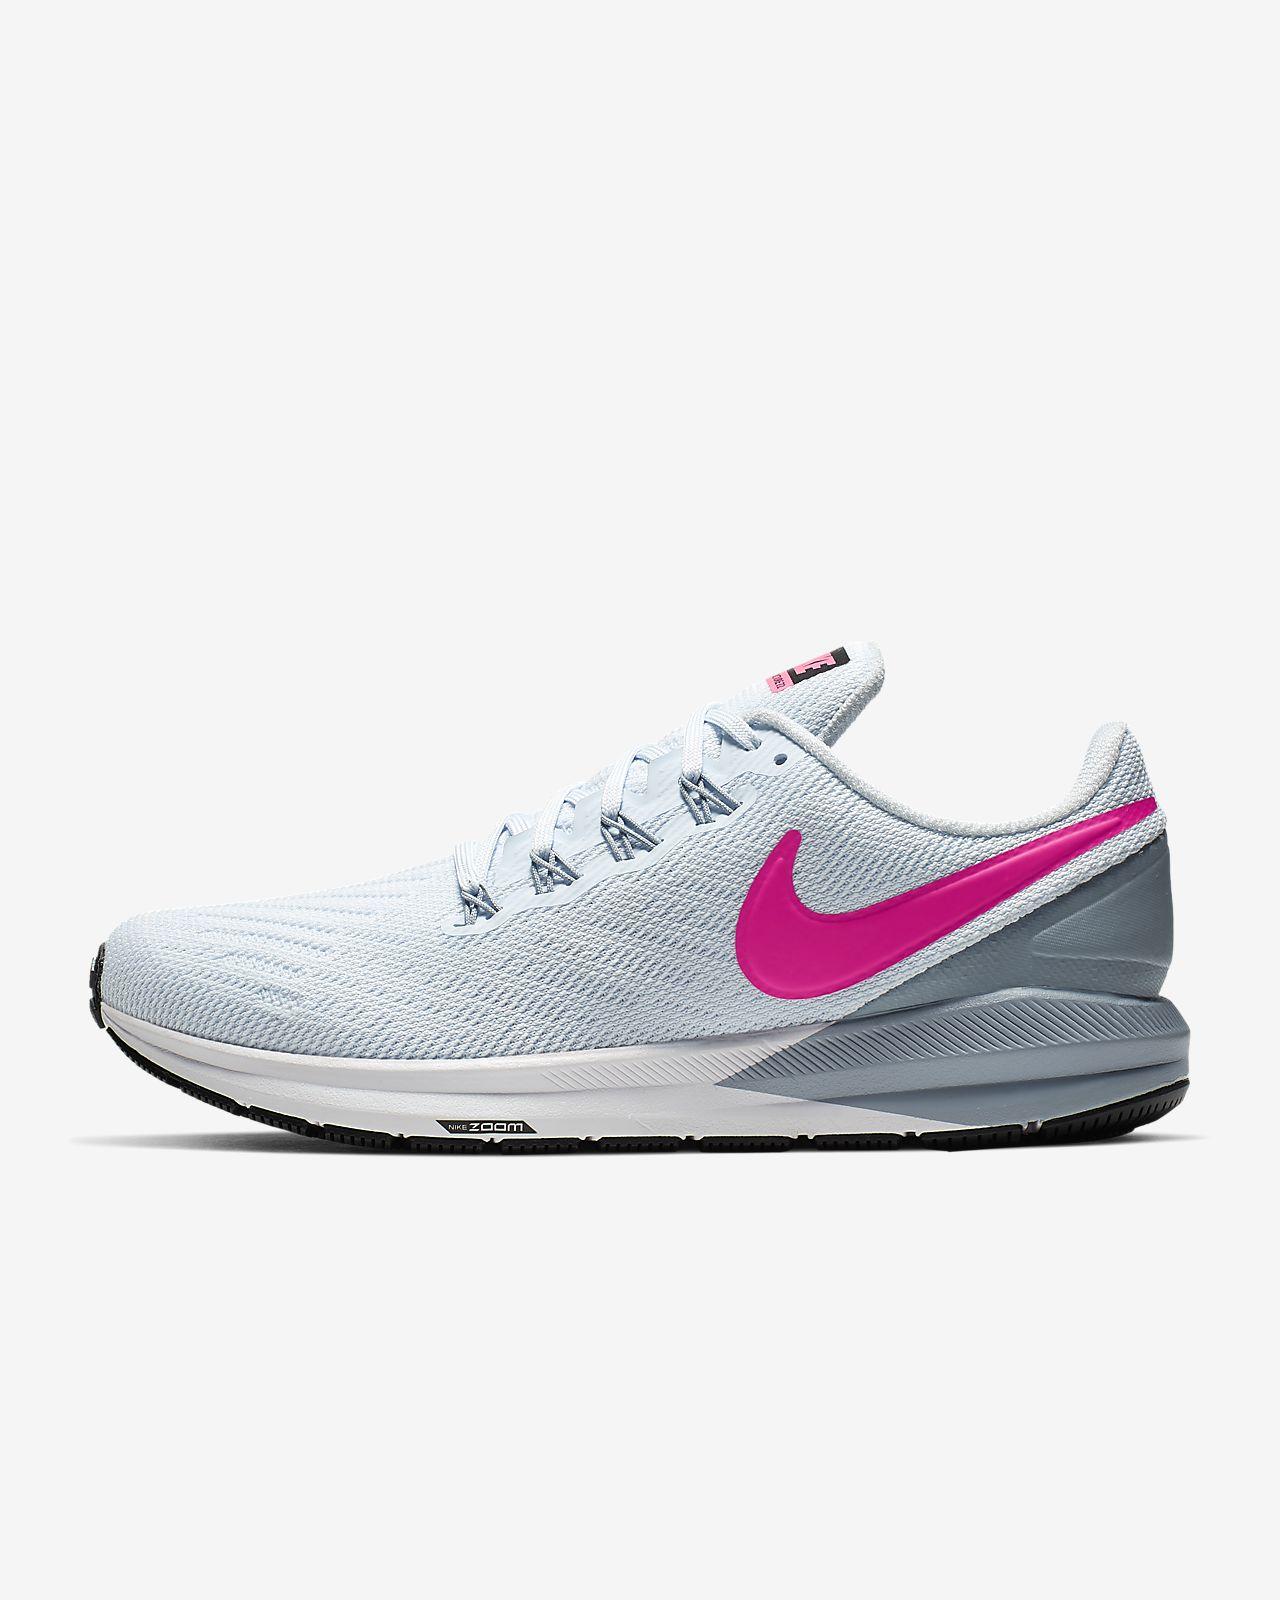 Женские беговые кроссовки Nike Air Zoom Structure 22